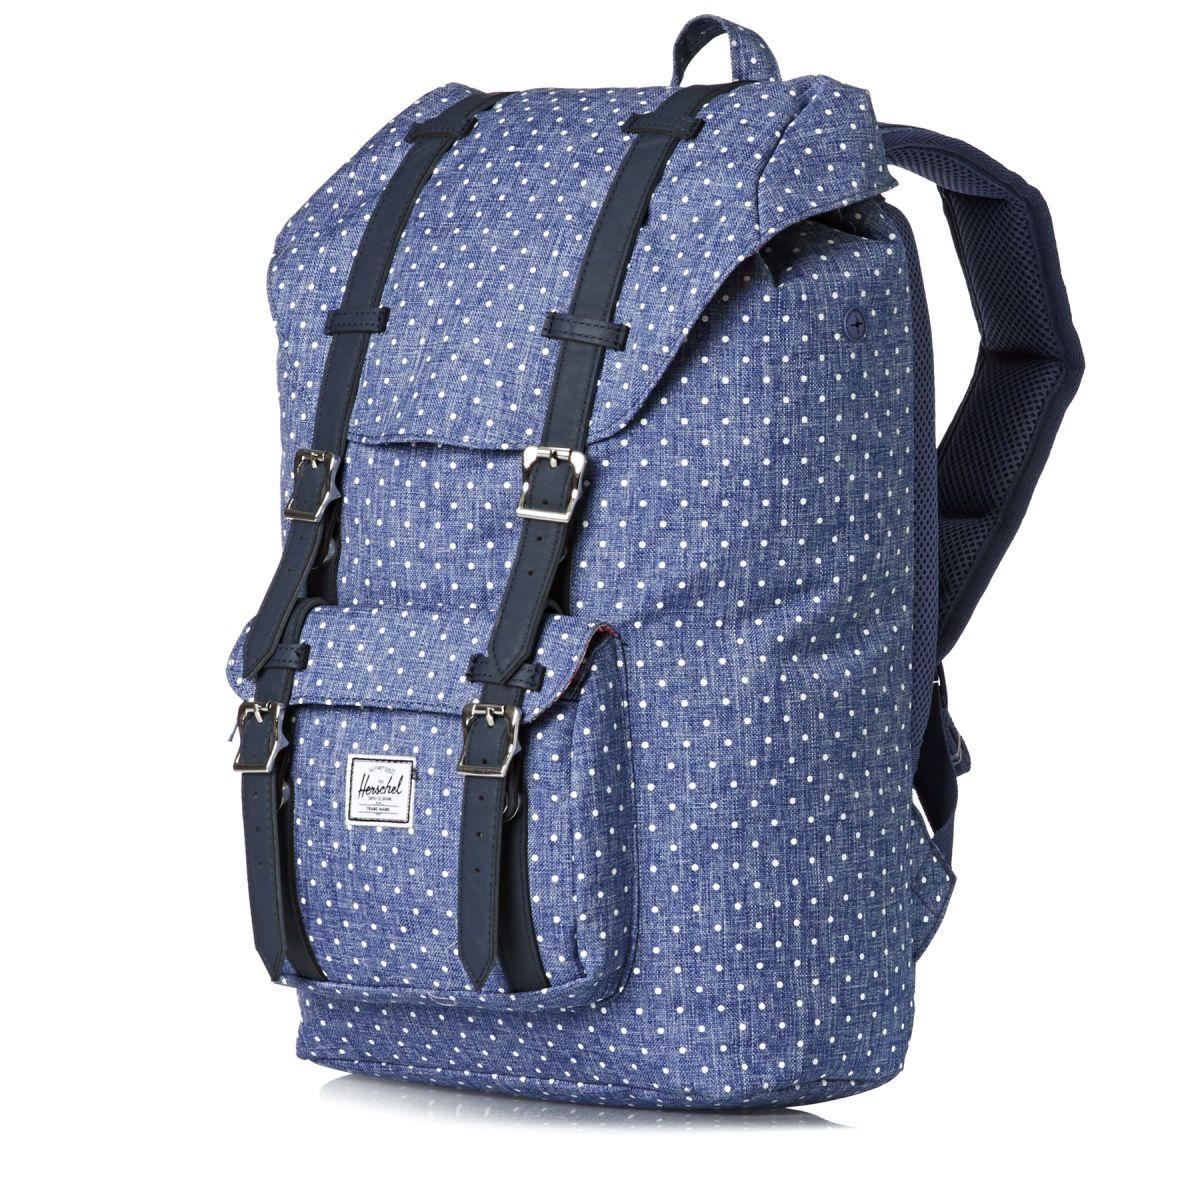 Herschel Backpacks - Herschel Little America Mid-volume Laptop Backpack -  Limoges Crosshatch/white